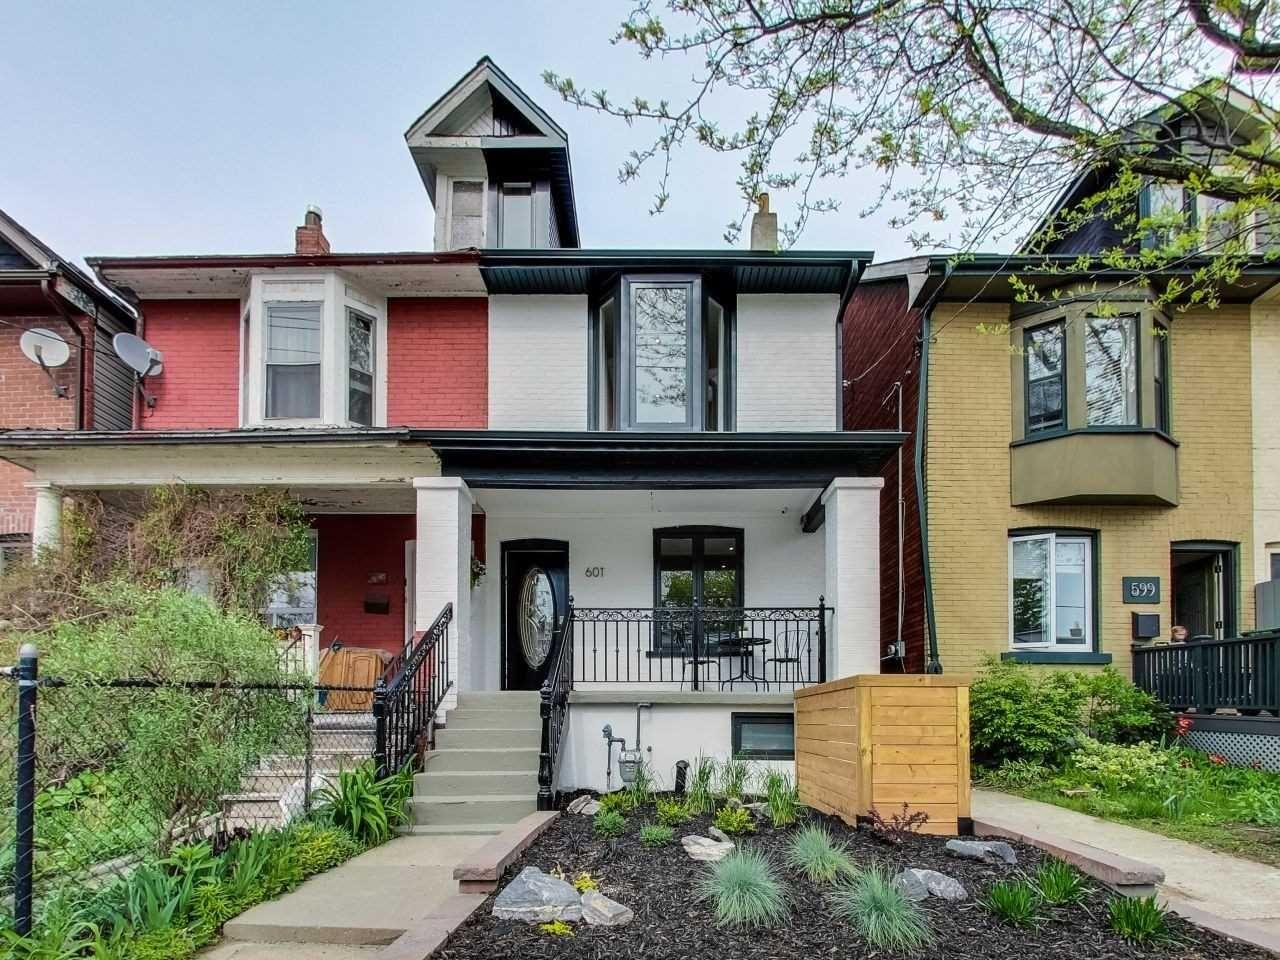 Main Photo: 601B Pape Avenue in Toronto: South Riverdale House (2 1/2 Storey) for lease (Toronto E01)  : MLS®# E4749048